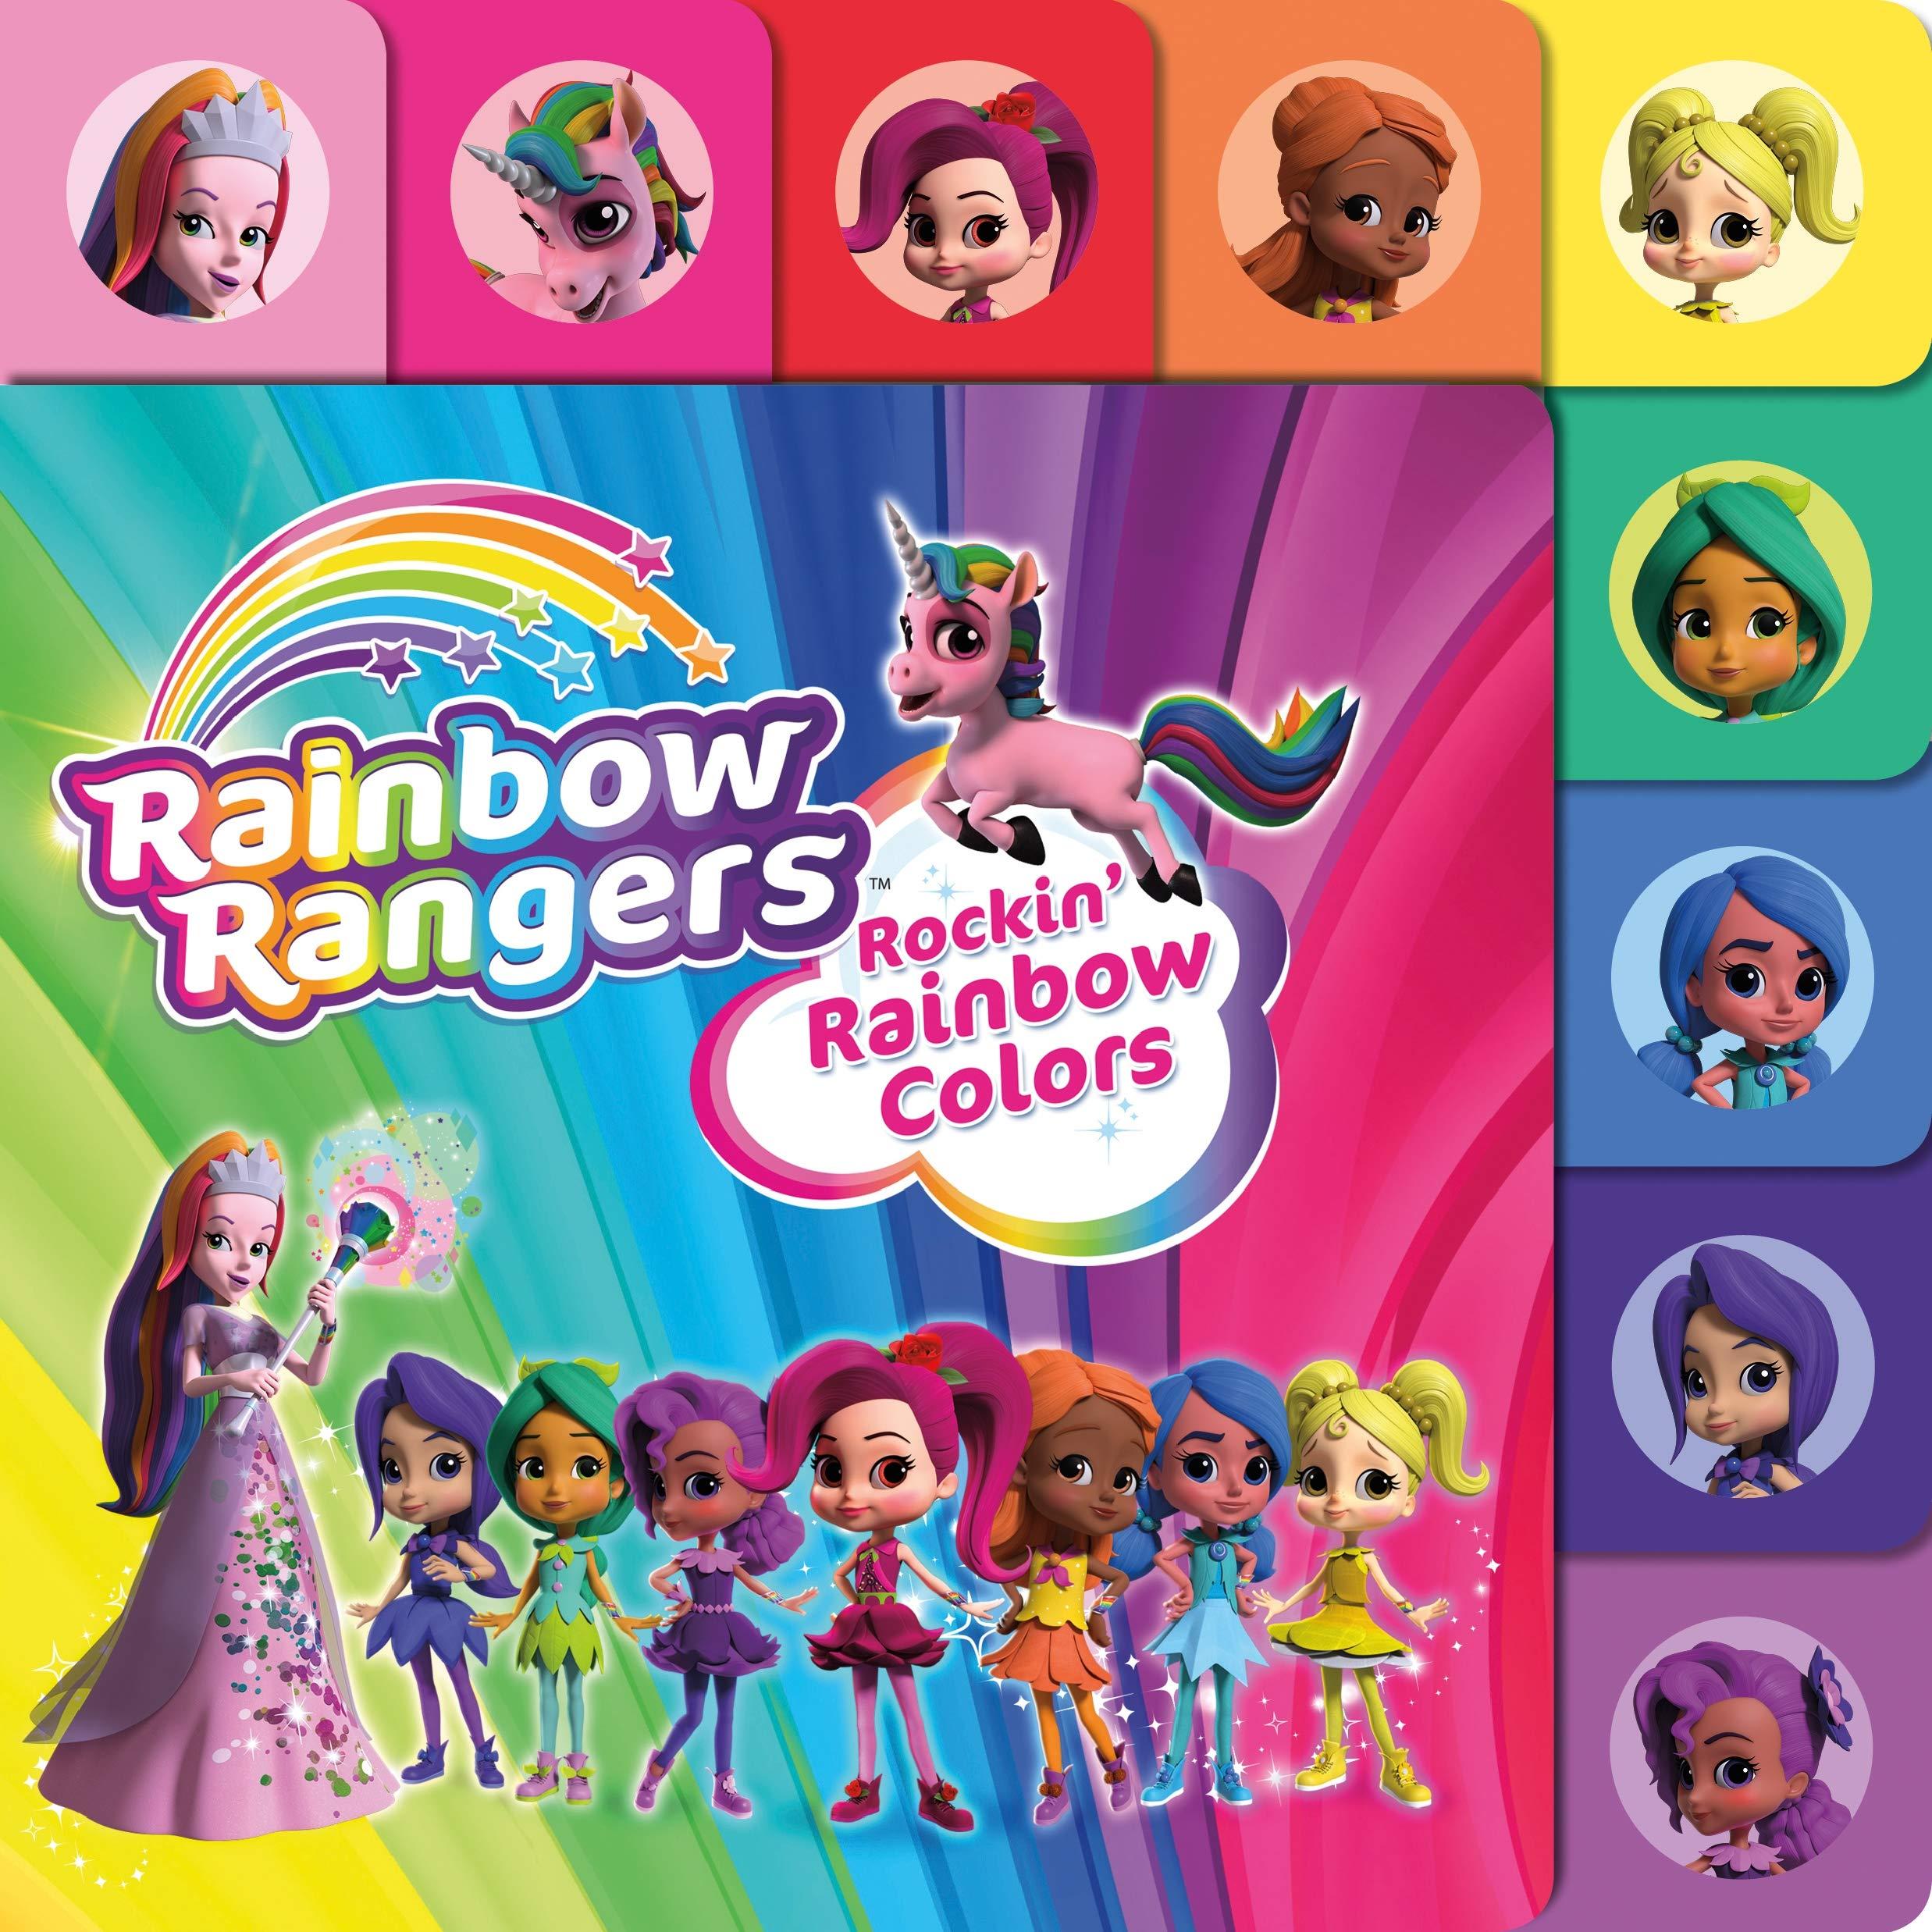 Amazon Com Rainbow Rangers Rockin Rainbow Colors 9781250190345 Greene Summer Books